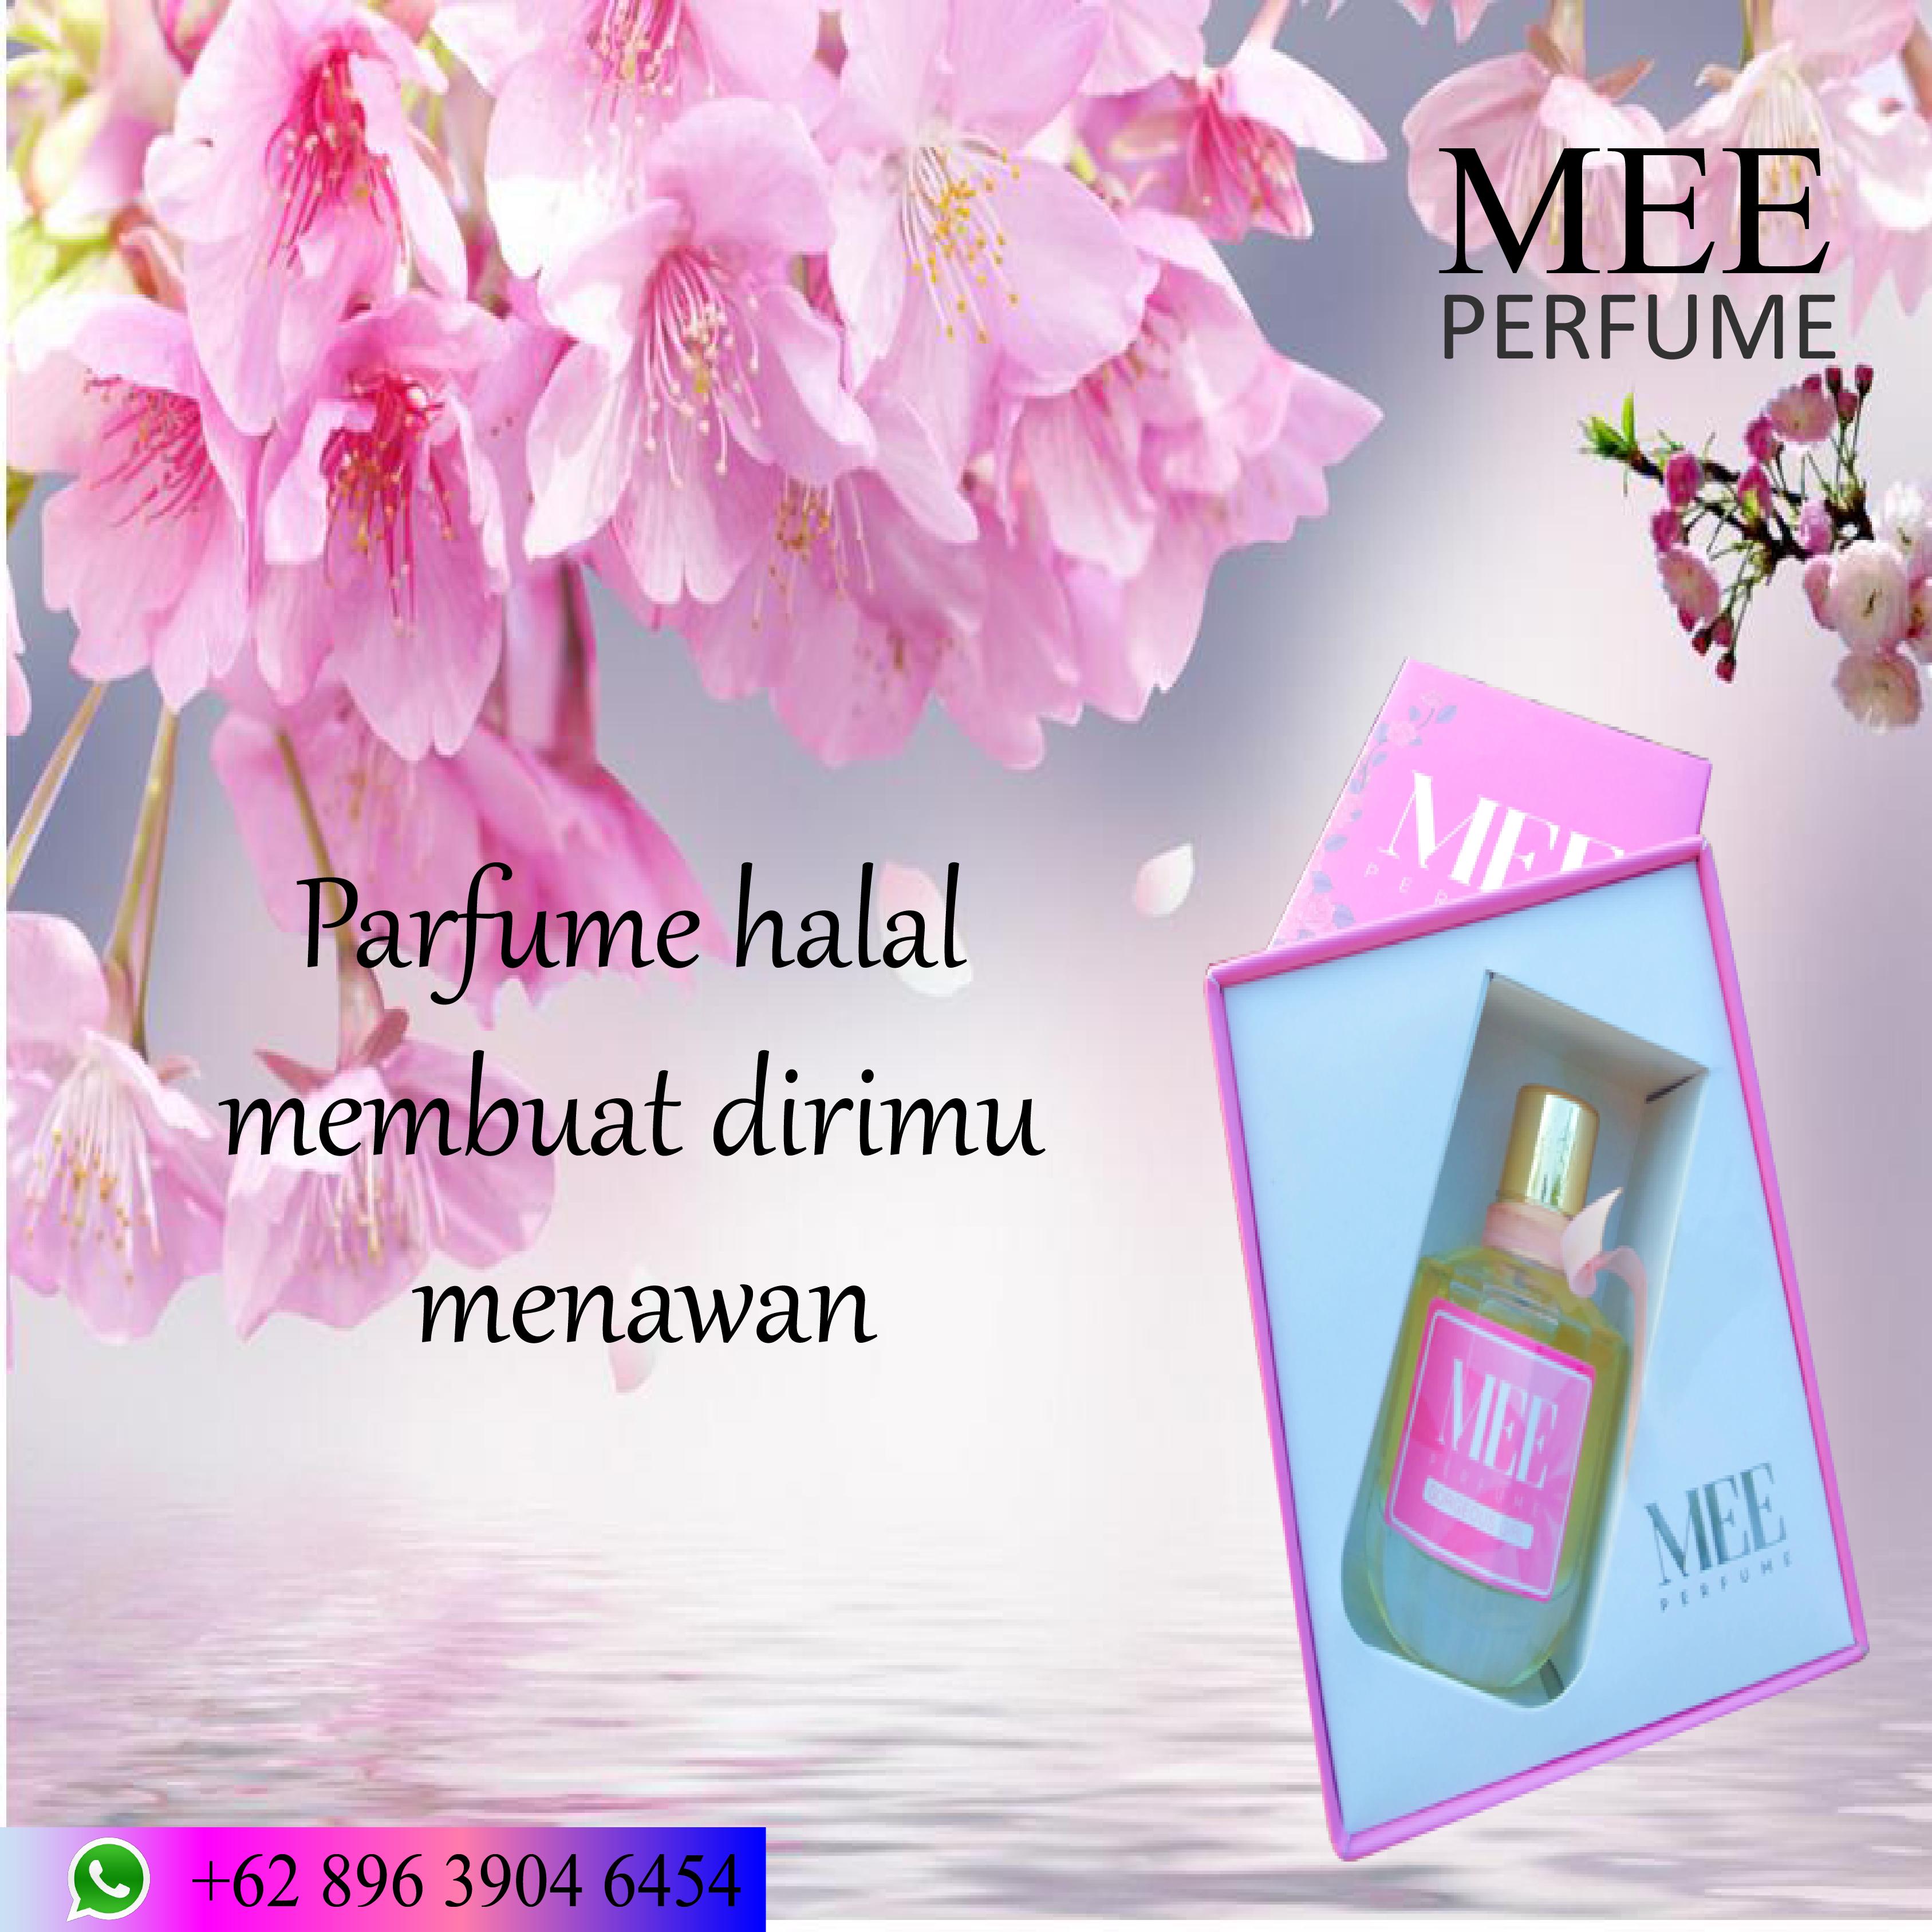 Termurah Parfum Wanita Fresh Mee 0896 3904 6454 Mee Perfume